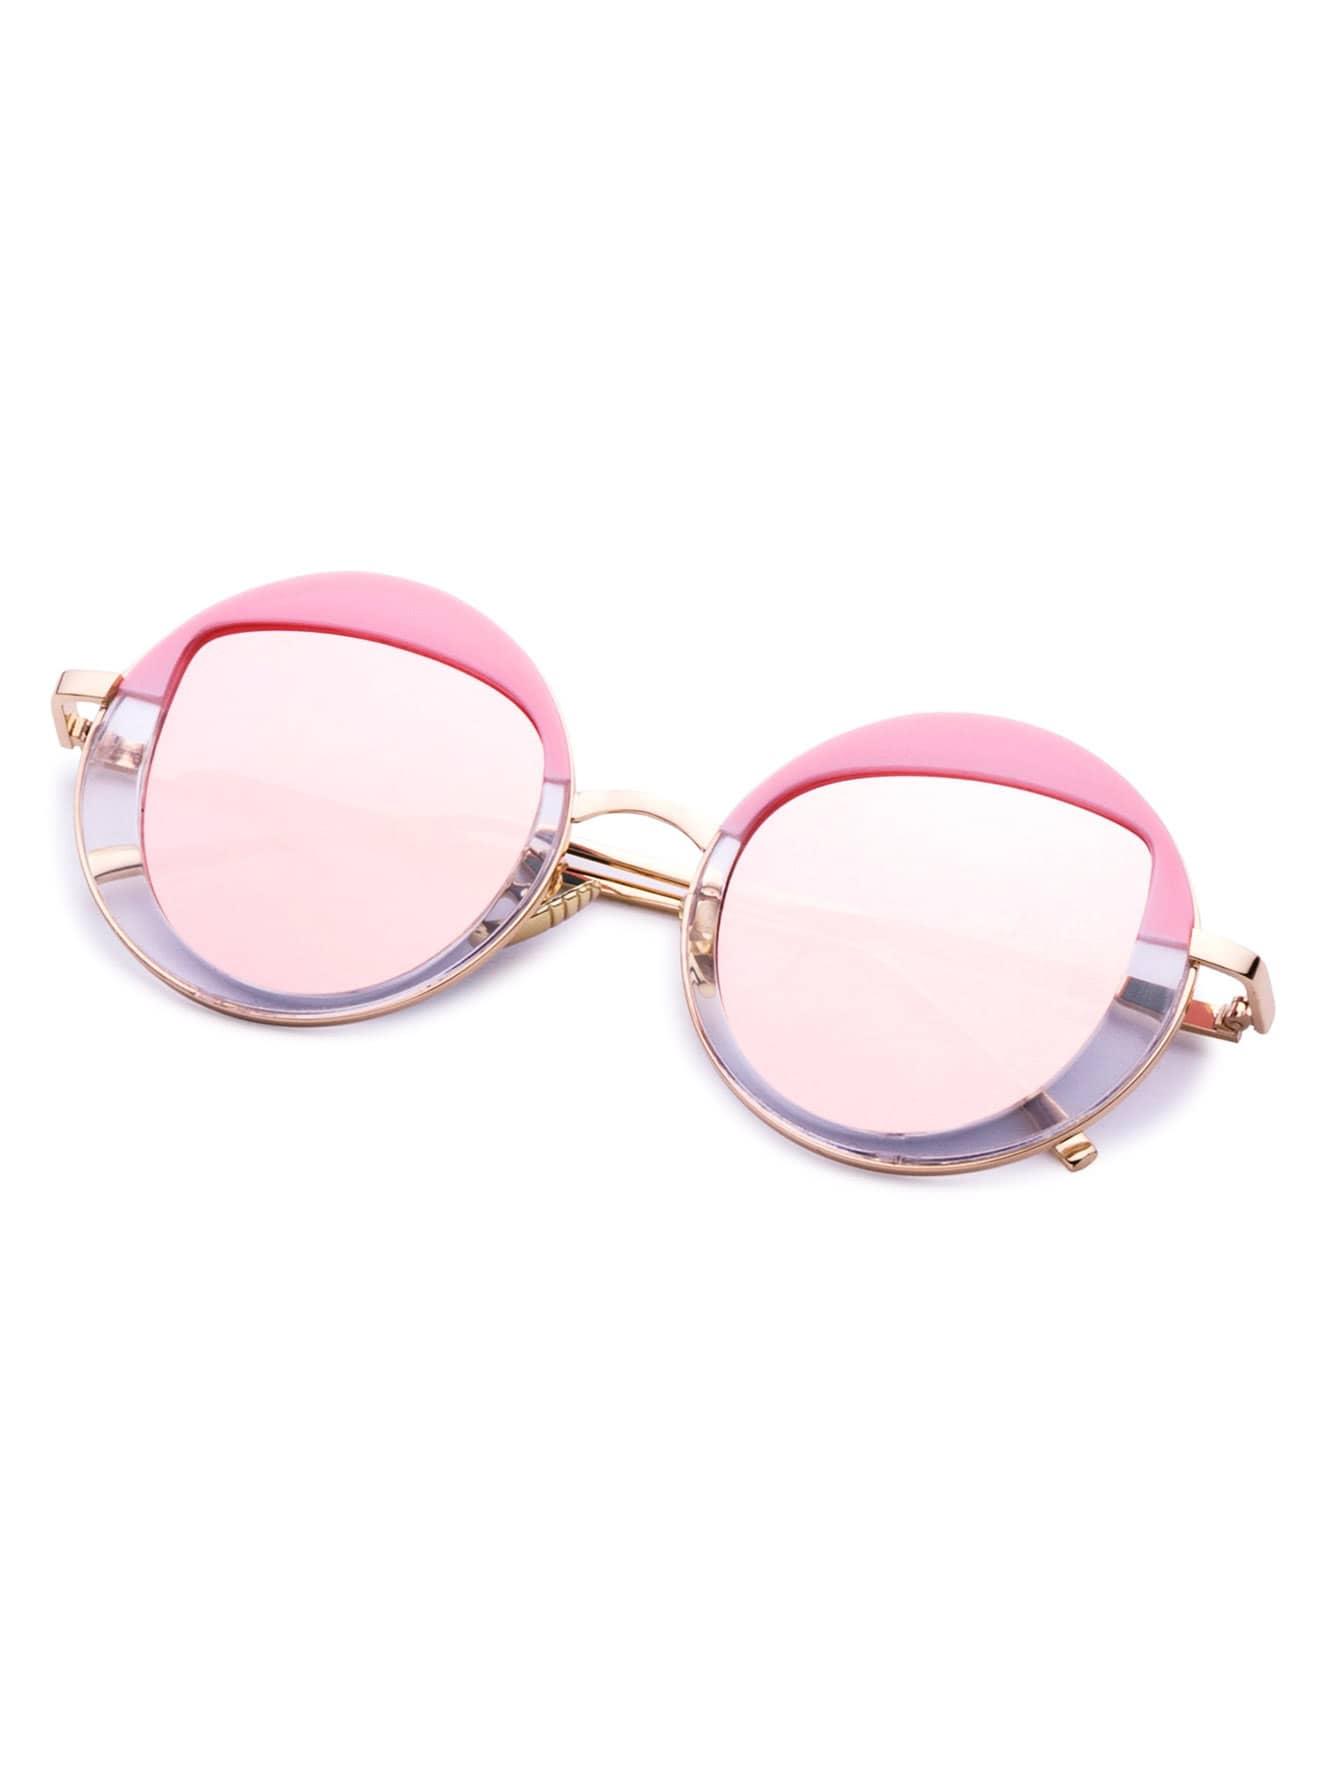 Pink And Gold Frame Round Design Sunglasses -SheIn(Sheinside)